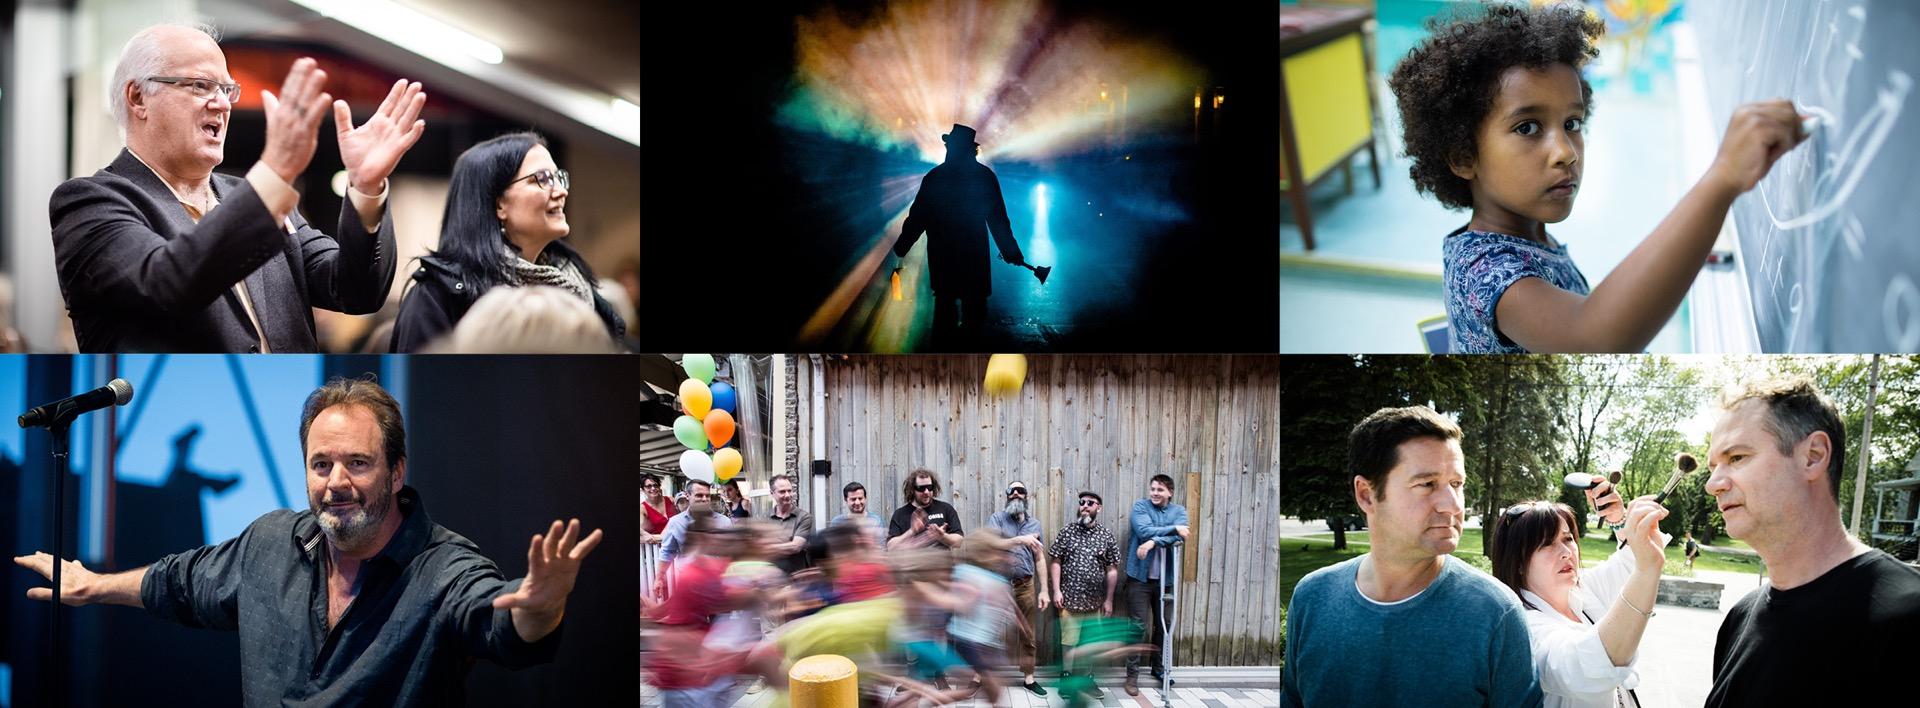 Olivier-Lamarre-photo-evenement.jpg